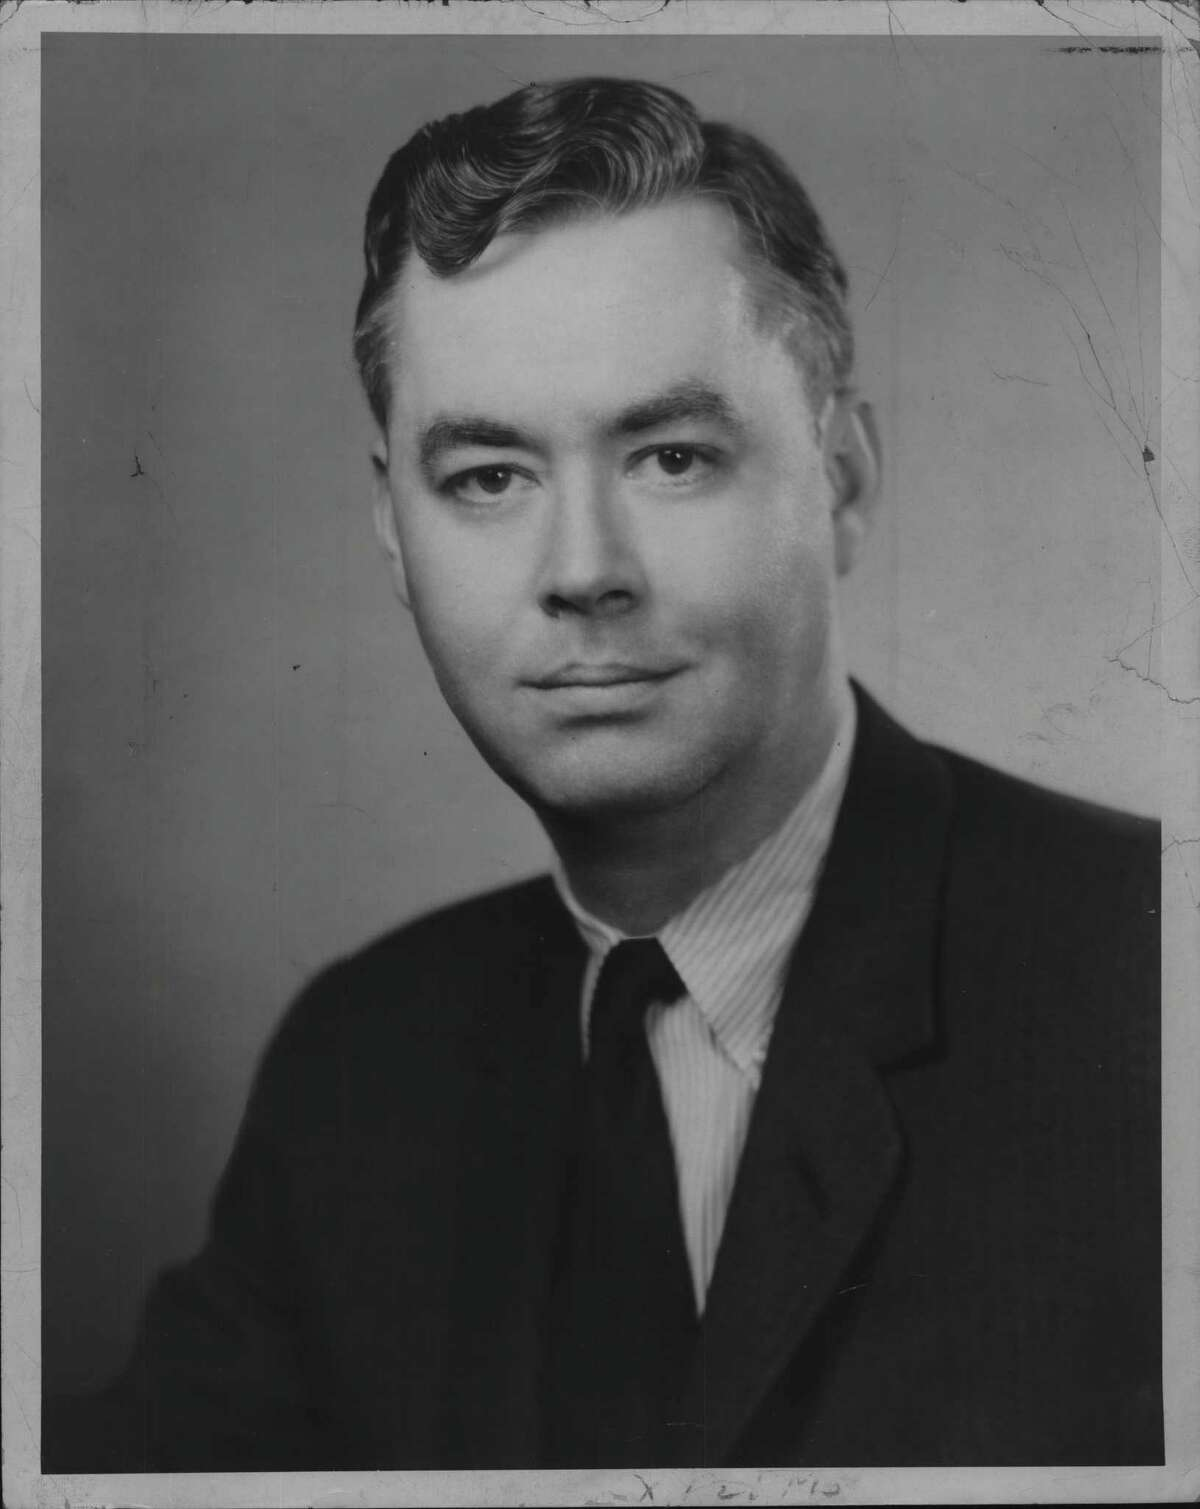 Senator Daniel Patrick Moynihan. April 8, 1963 (Knickerbocker News Staff Photo/Times Union Archive)